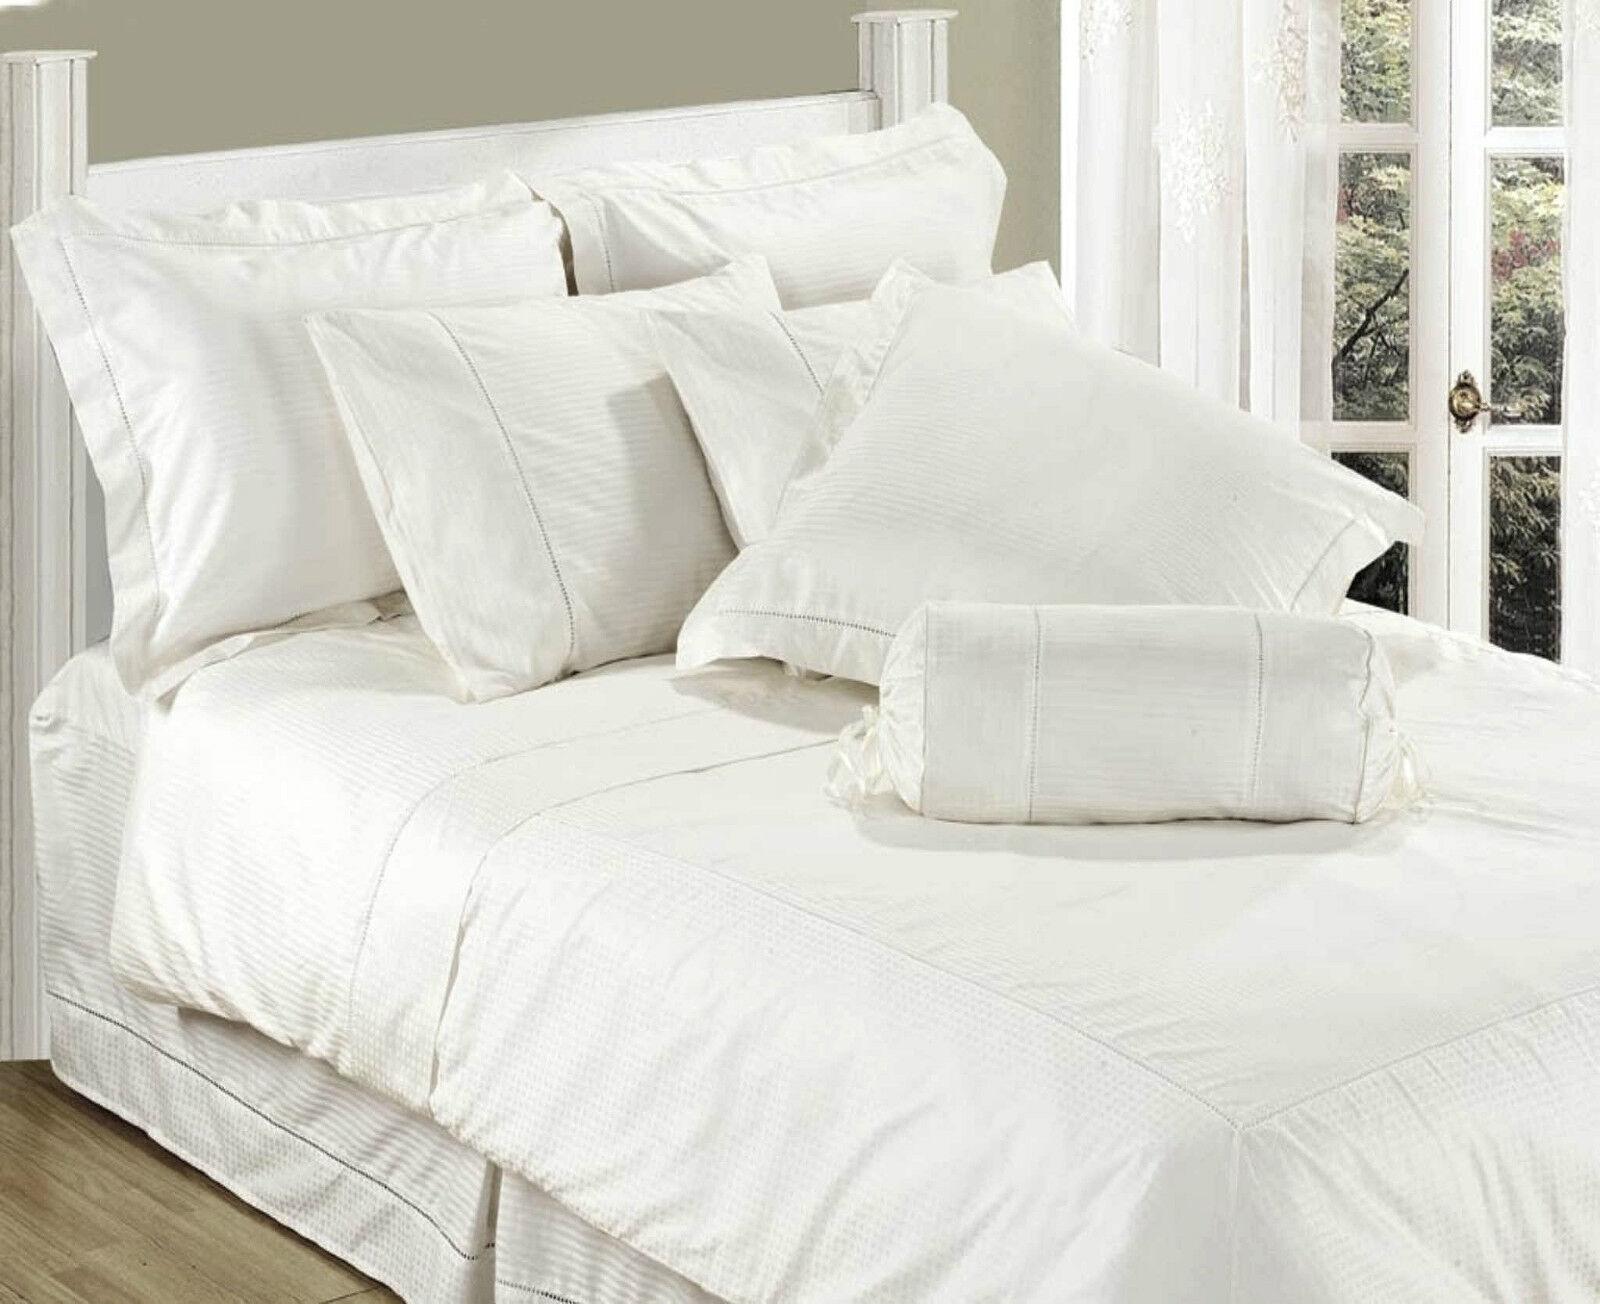 KING SIZE FLAT SHEET WHITE LUXURY 100% COTTON 330 THREAD COUNT STRIPE SATEEN